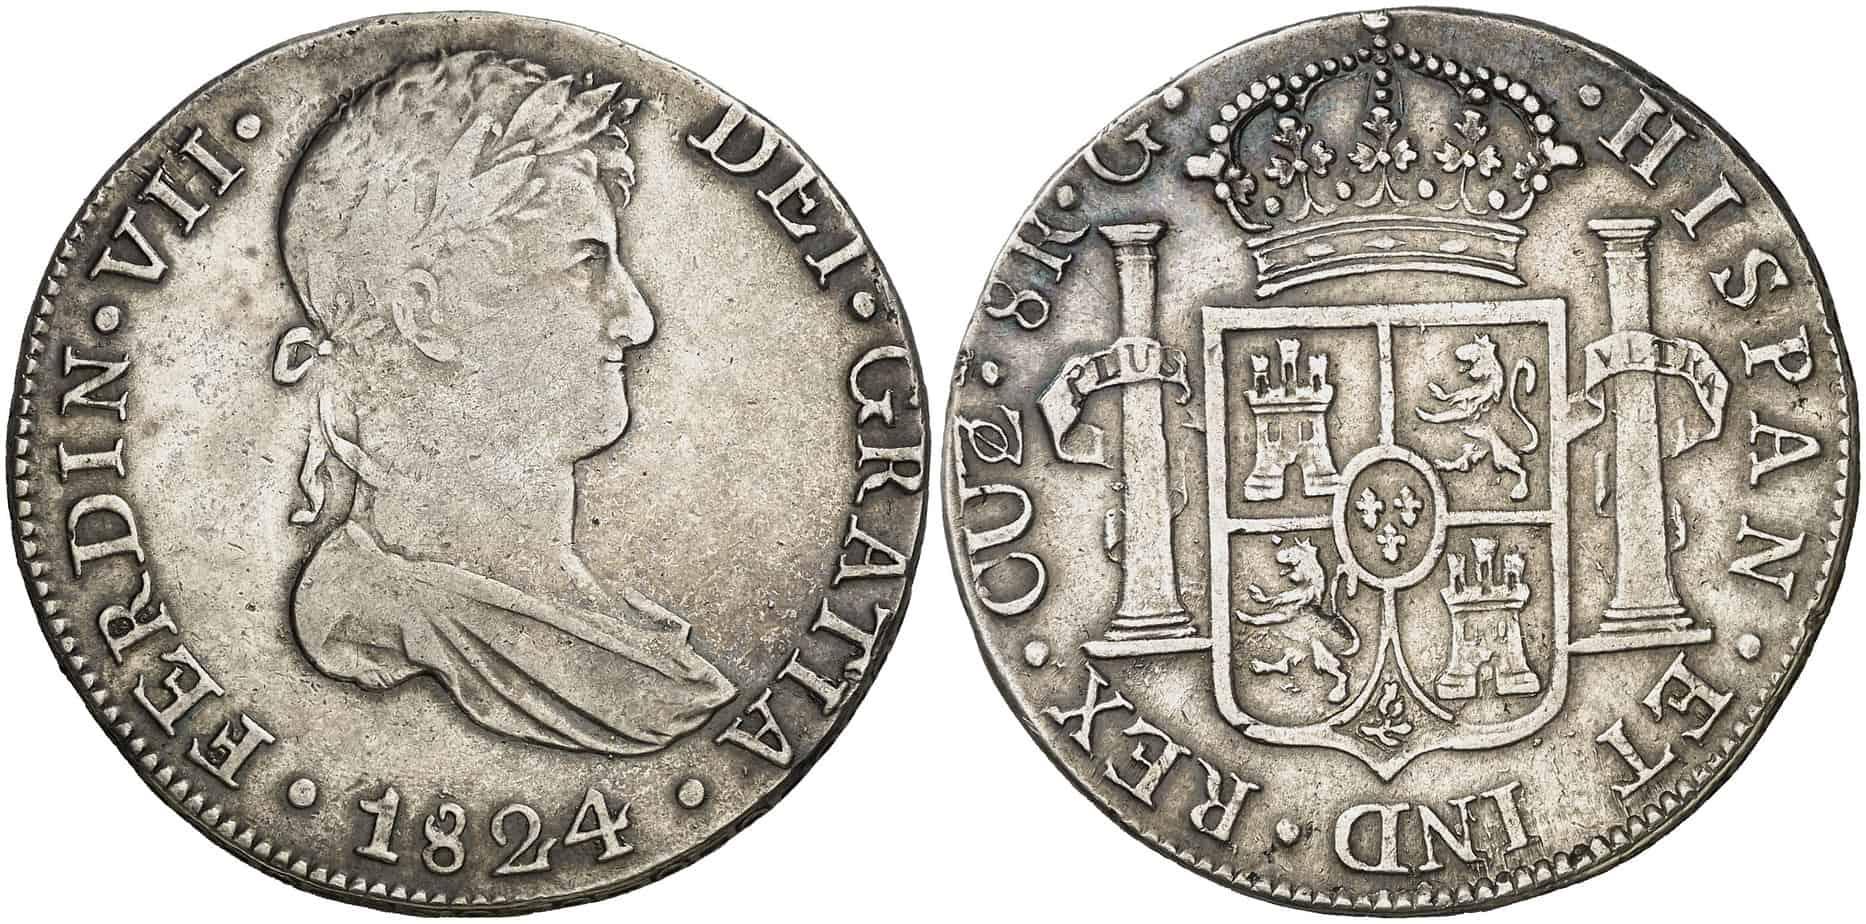 8 reales Cuzco 1824 G